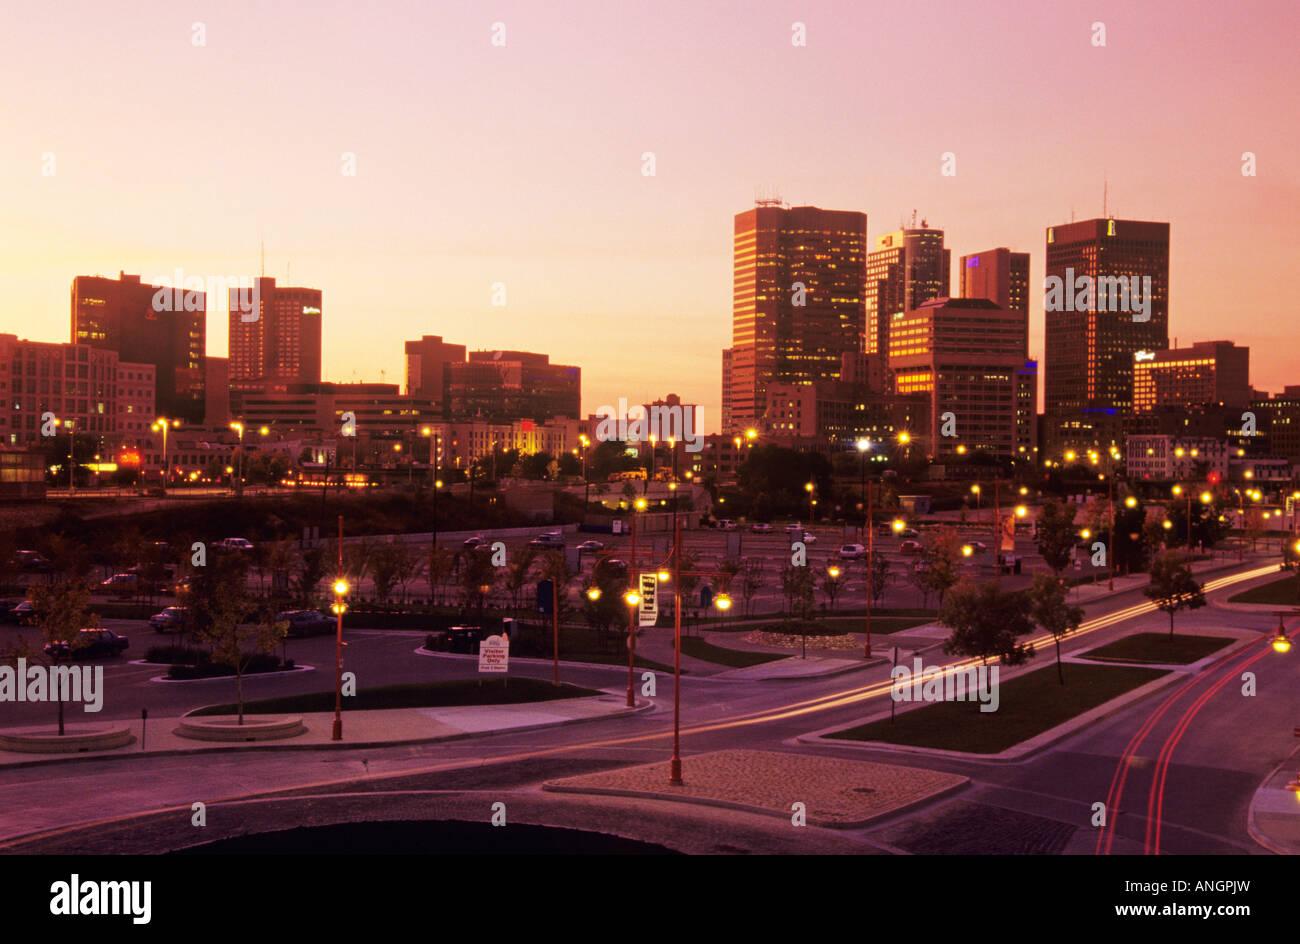 Winnipeg skyline, Manitoba, Canada. - Stock Image